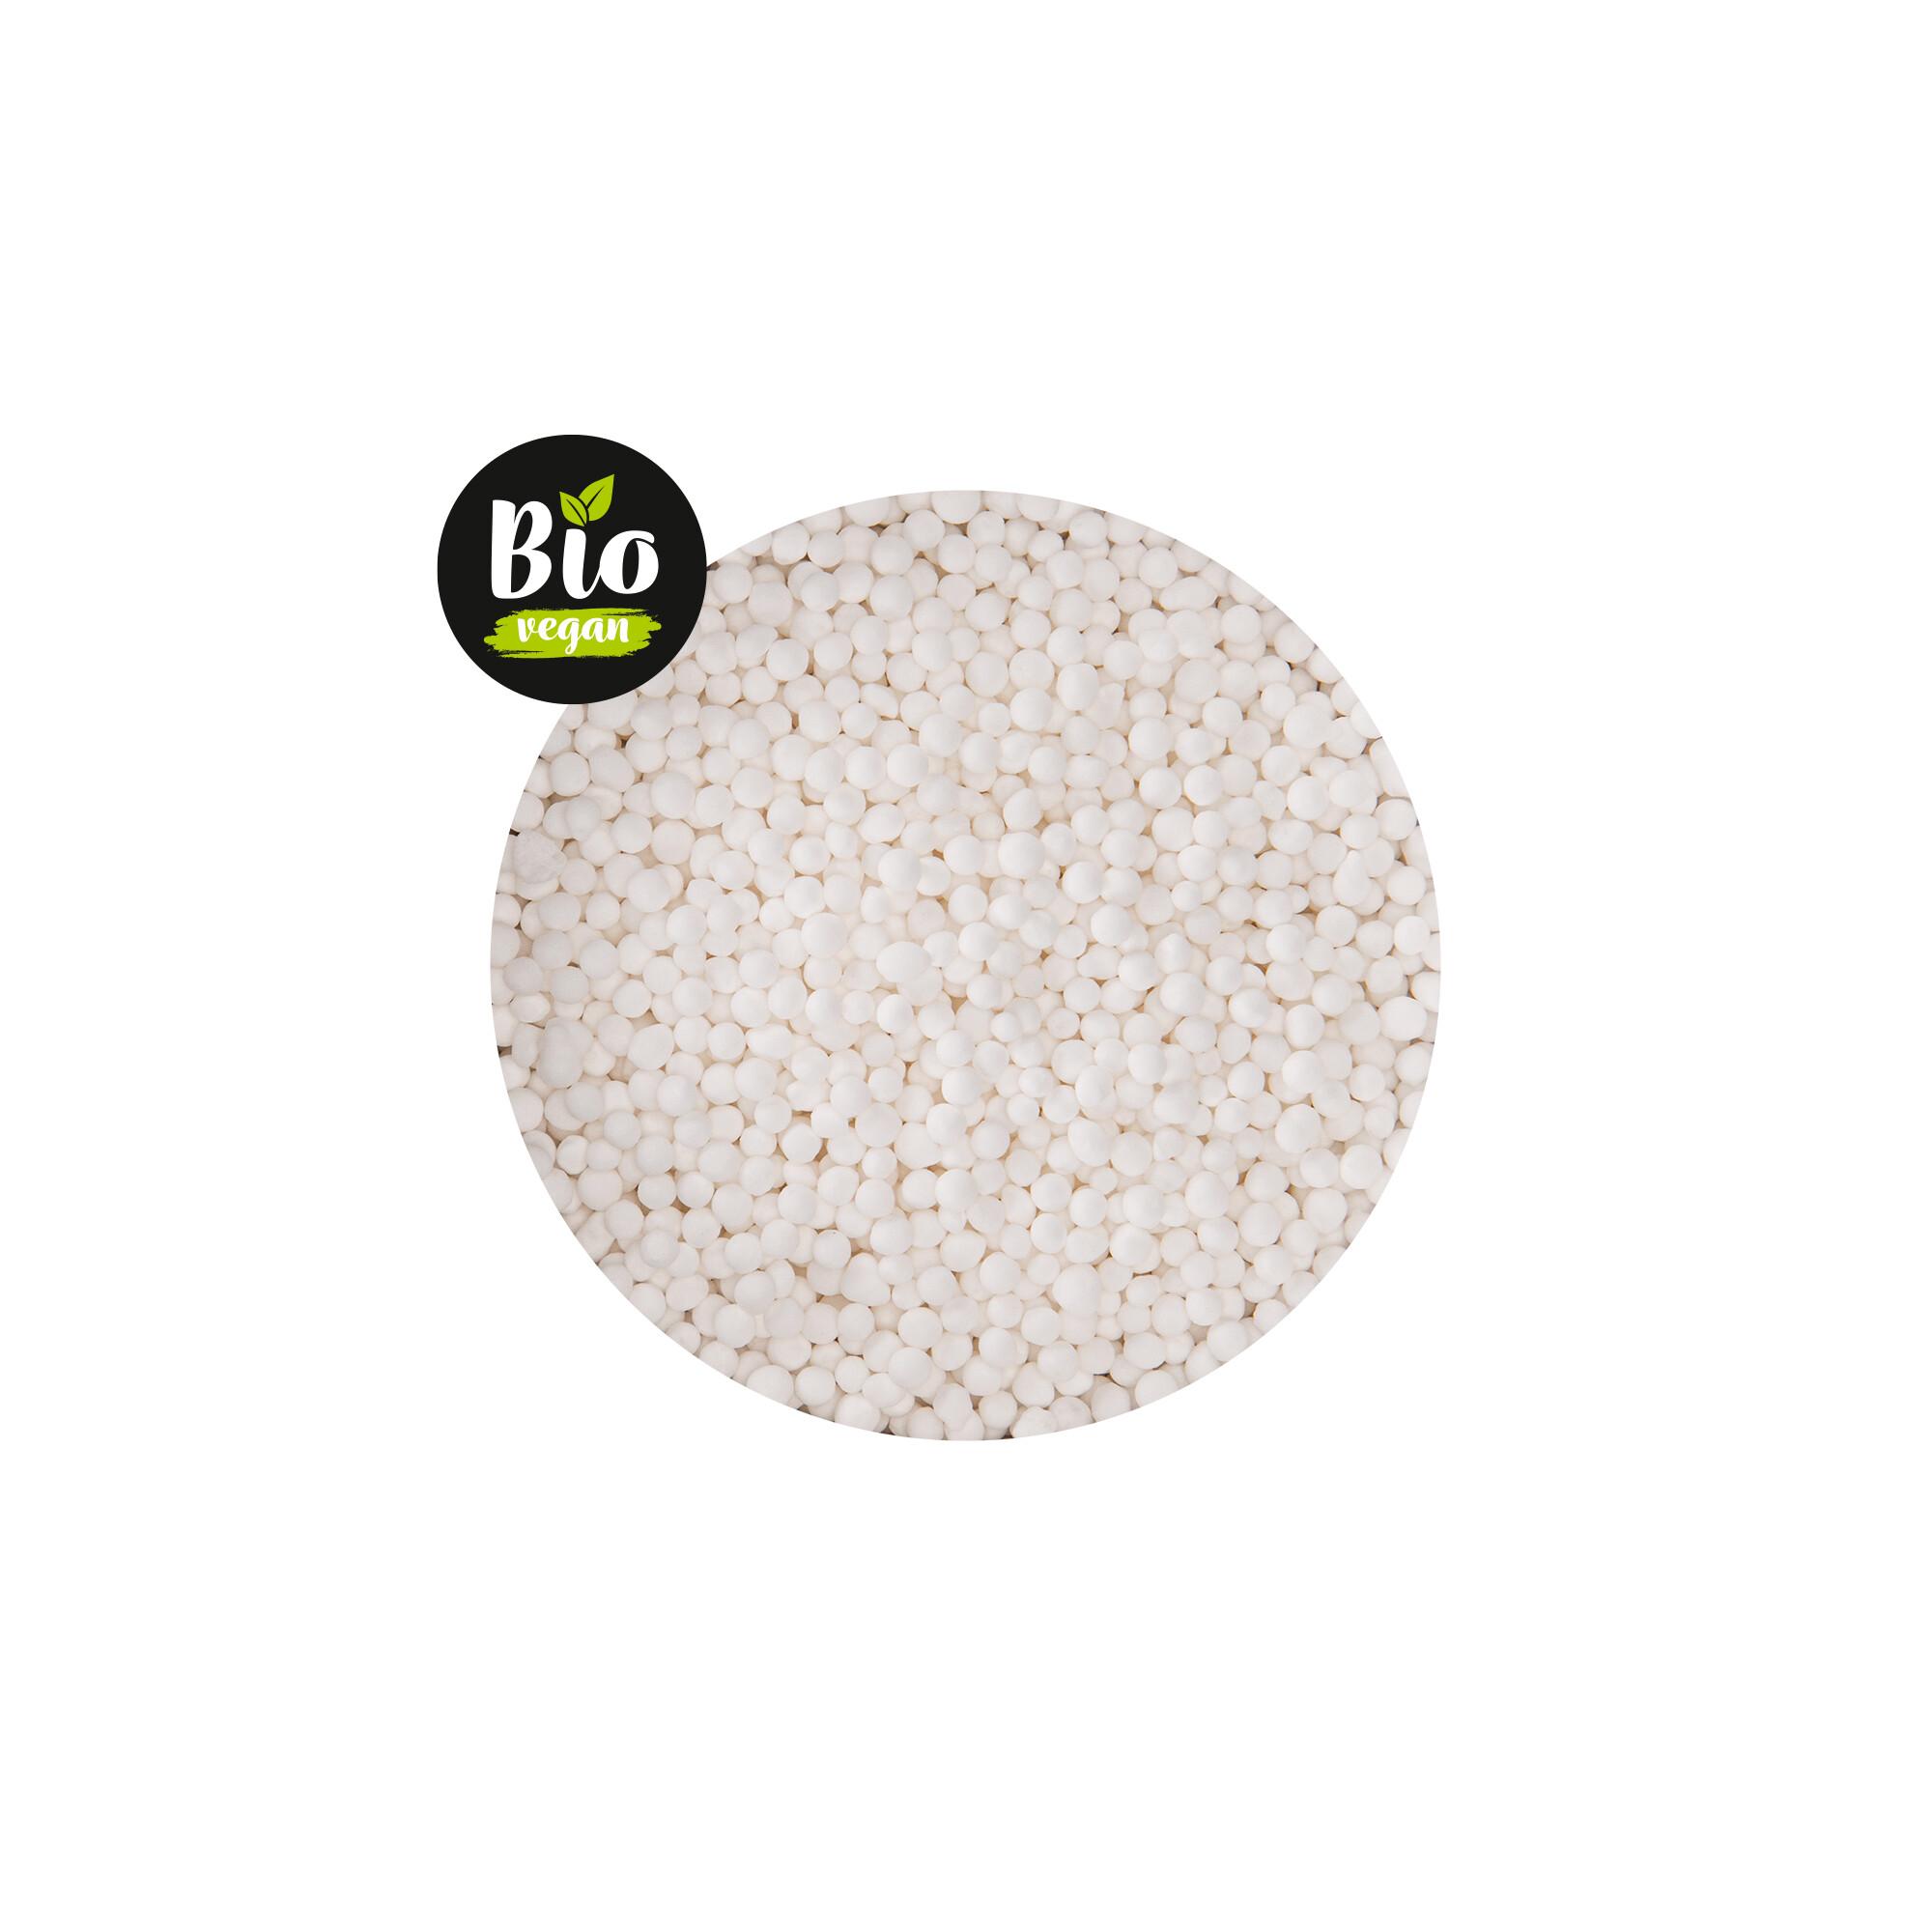 Edible sprinkle decoration - Organic Nonpareils